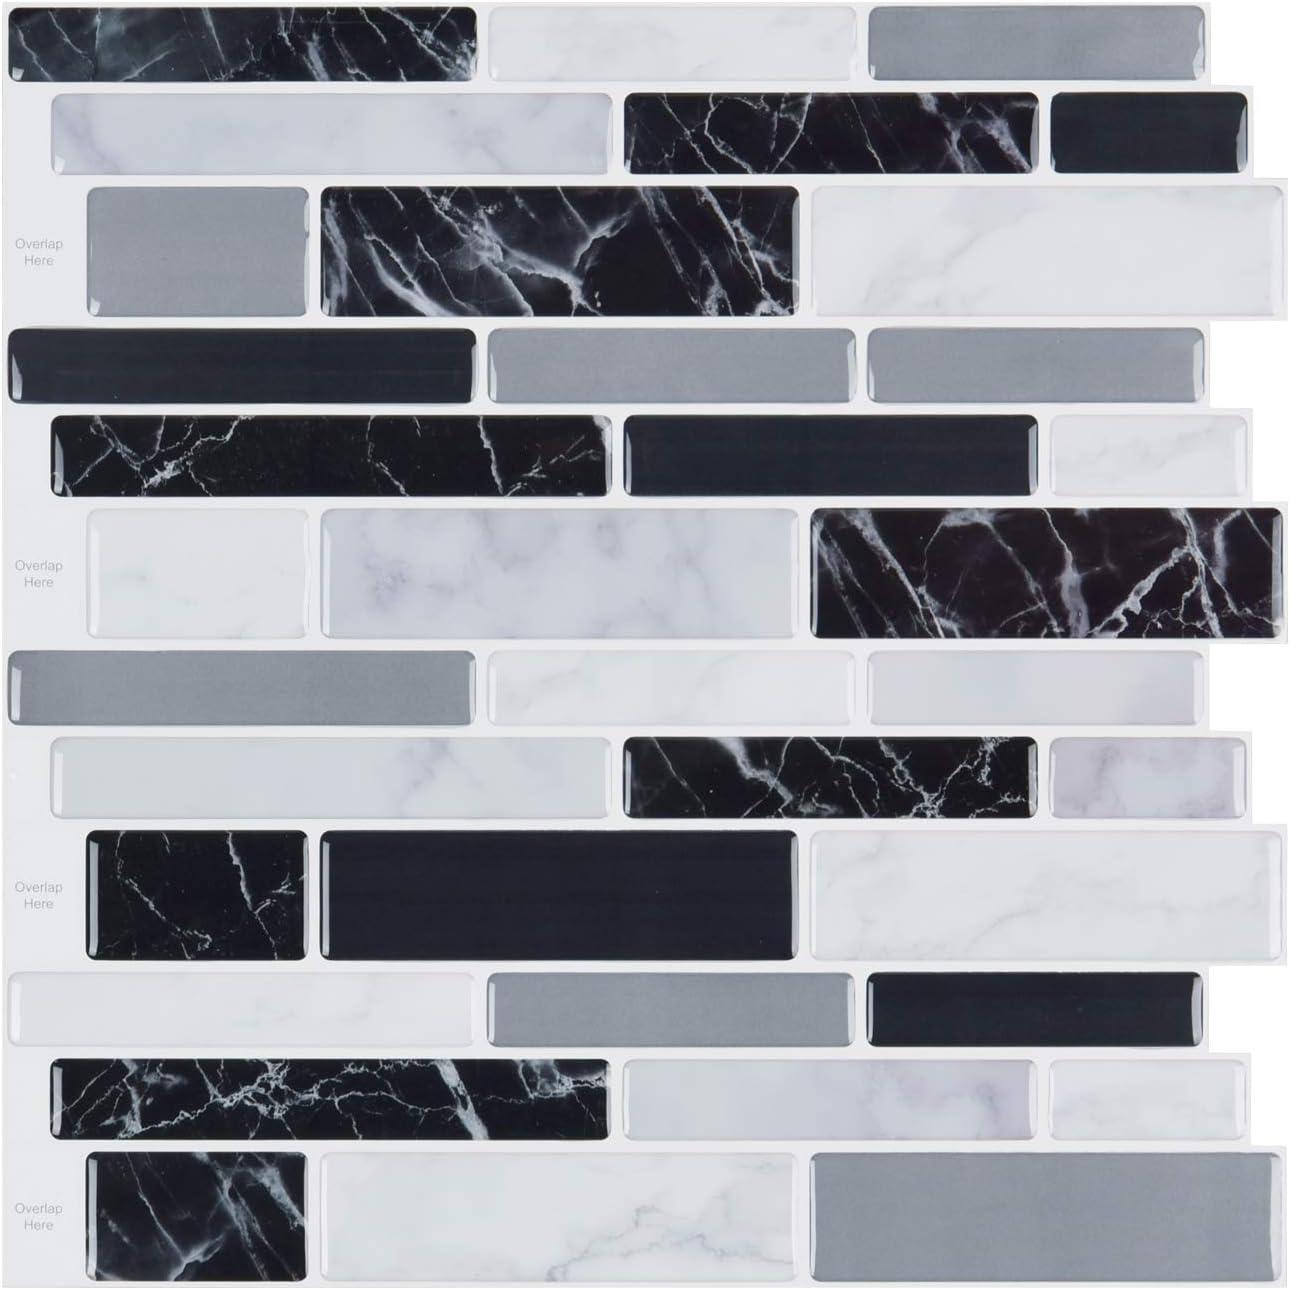 LONGKING 10-Sheet Peel and Stick Tile Backsplash, Vinyl 3D Self-Adhesive Tile Stickers for Kitchen, Bathroom, Counter Top, Marble 79 …